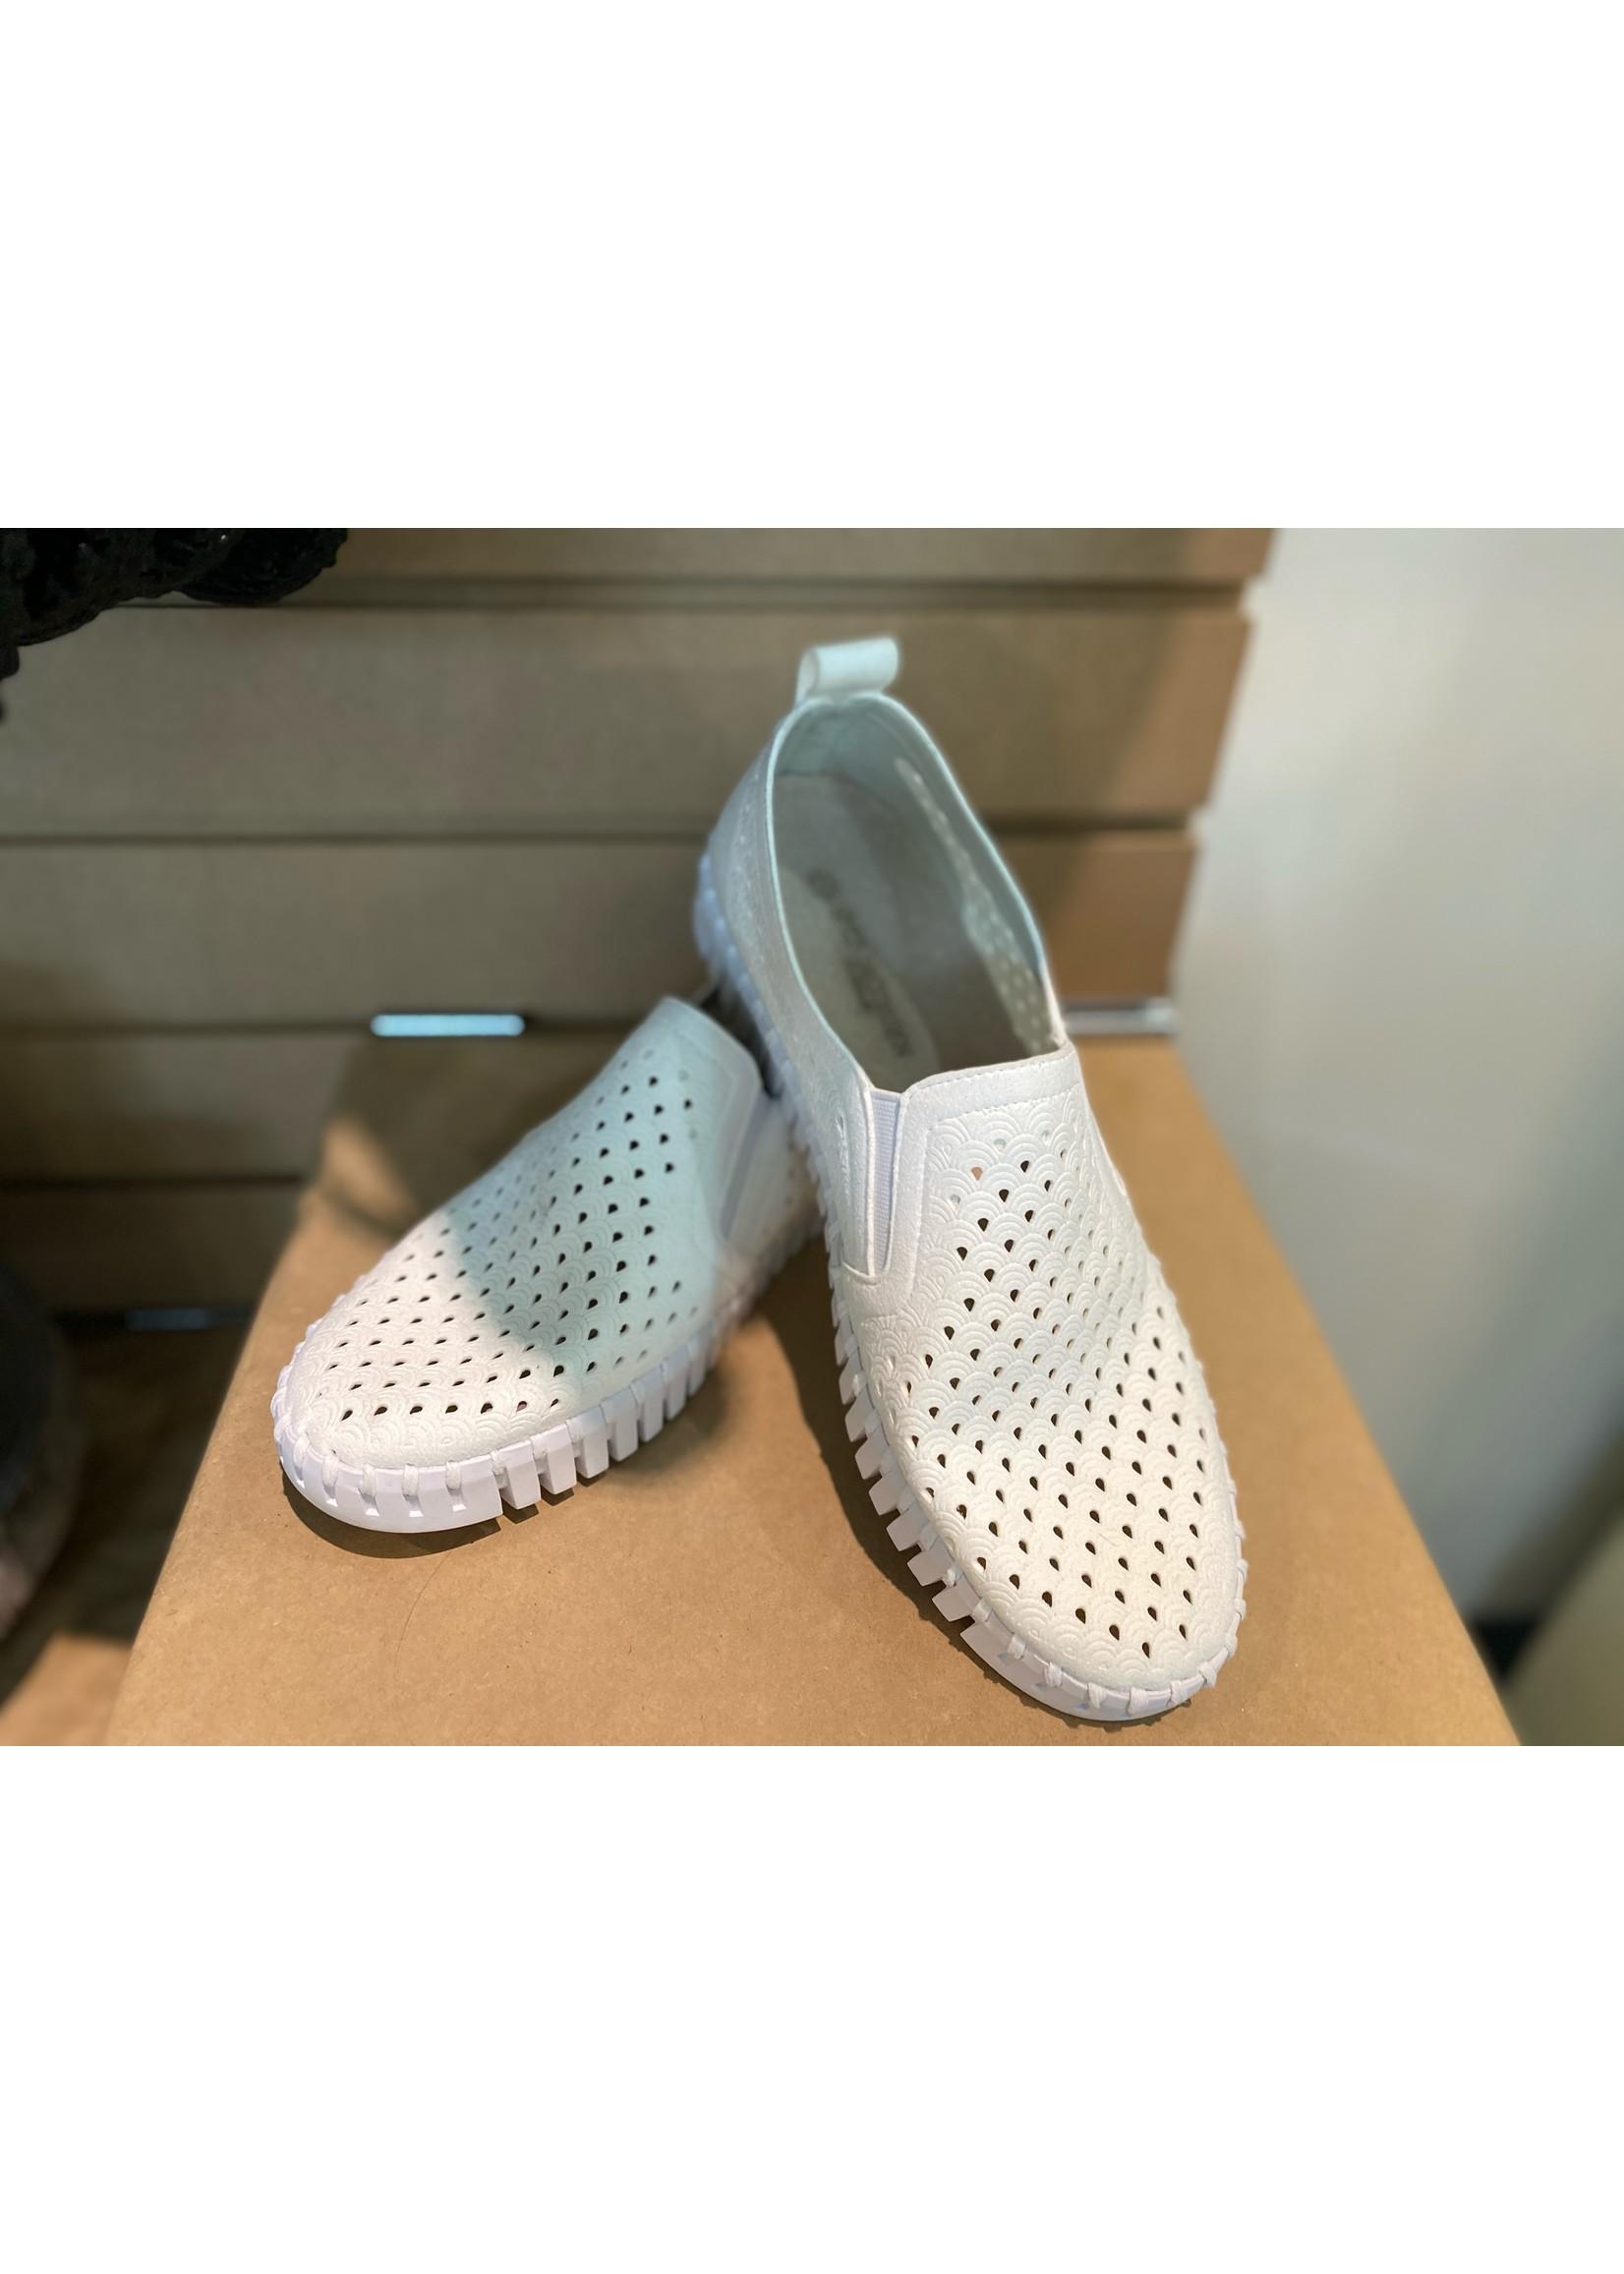 Ilse Jacobsen Tulip Shoe White 40